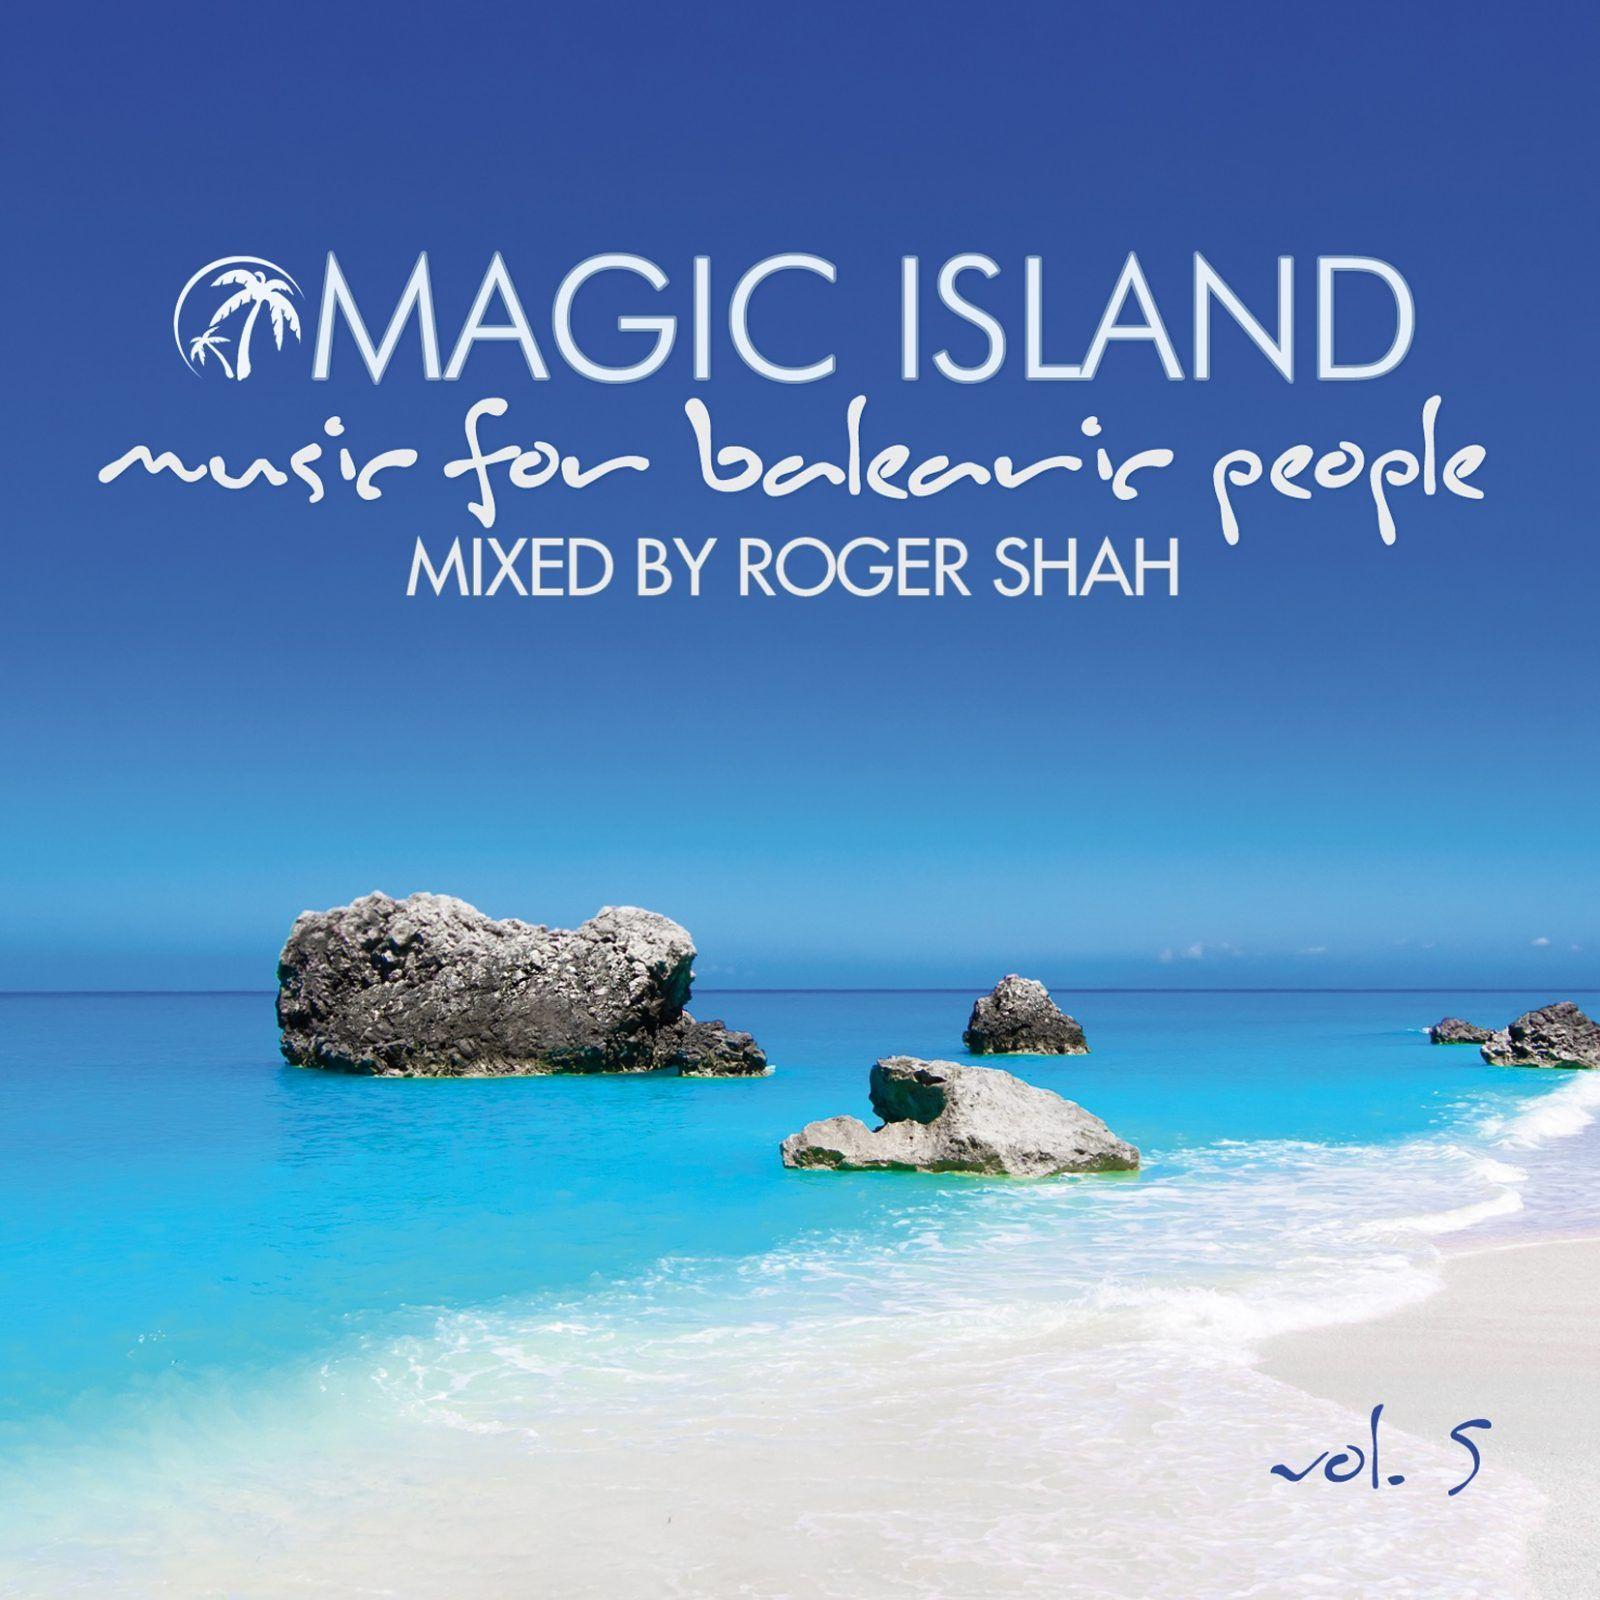 magic-island-cd-02.jpg